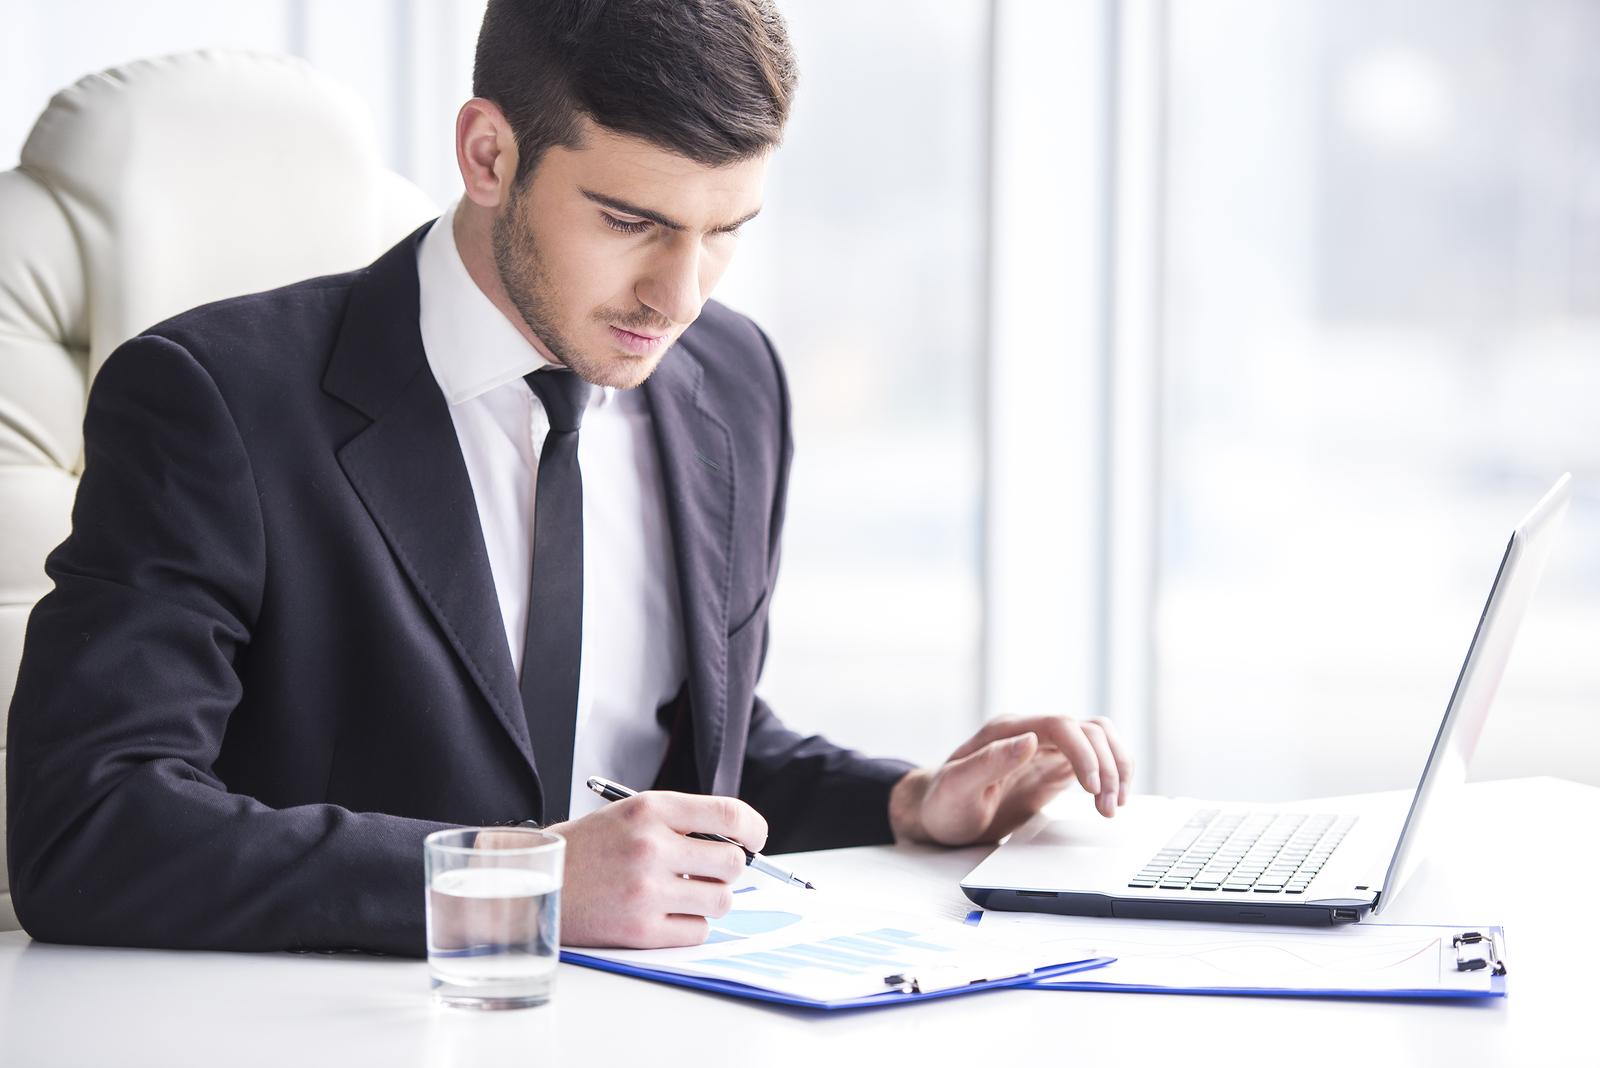 https://i2.wp.com/www.caproasia.com/wp-content/uploads/2015/08/Professional-Banker-3.jpg